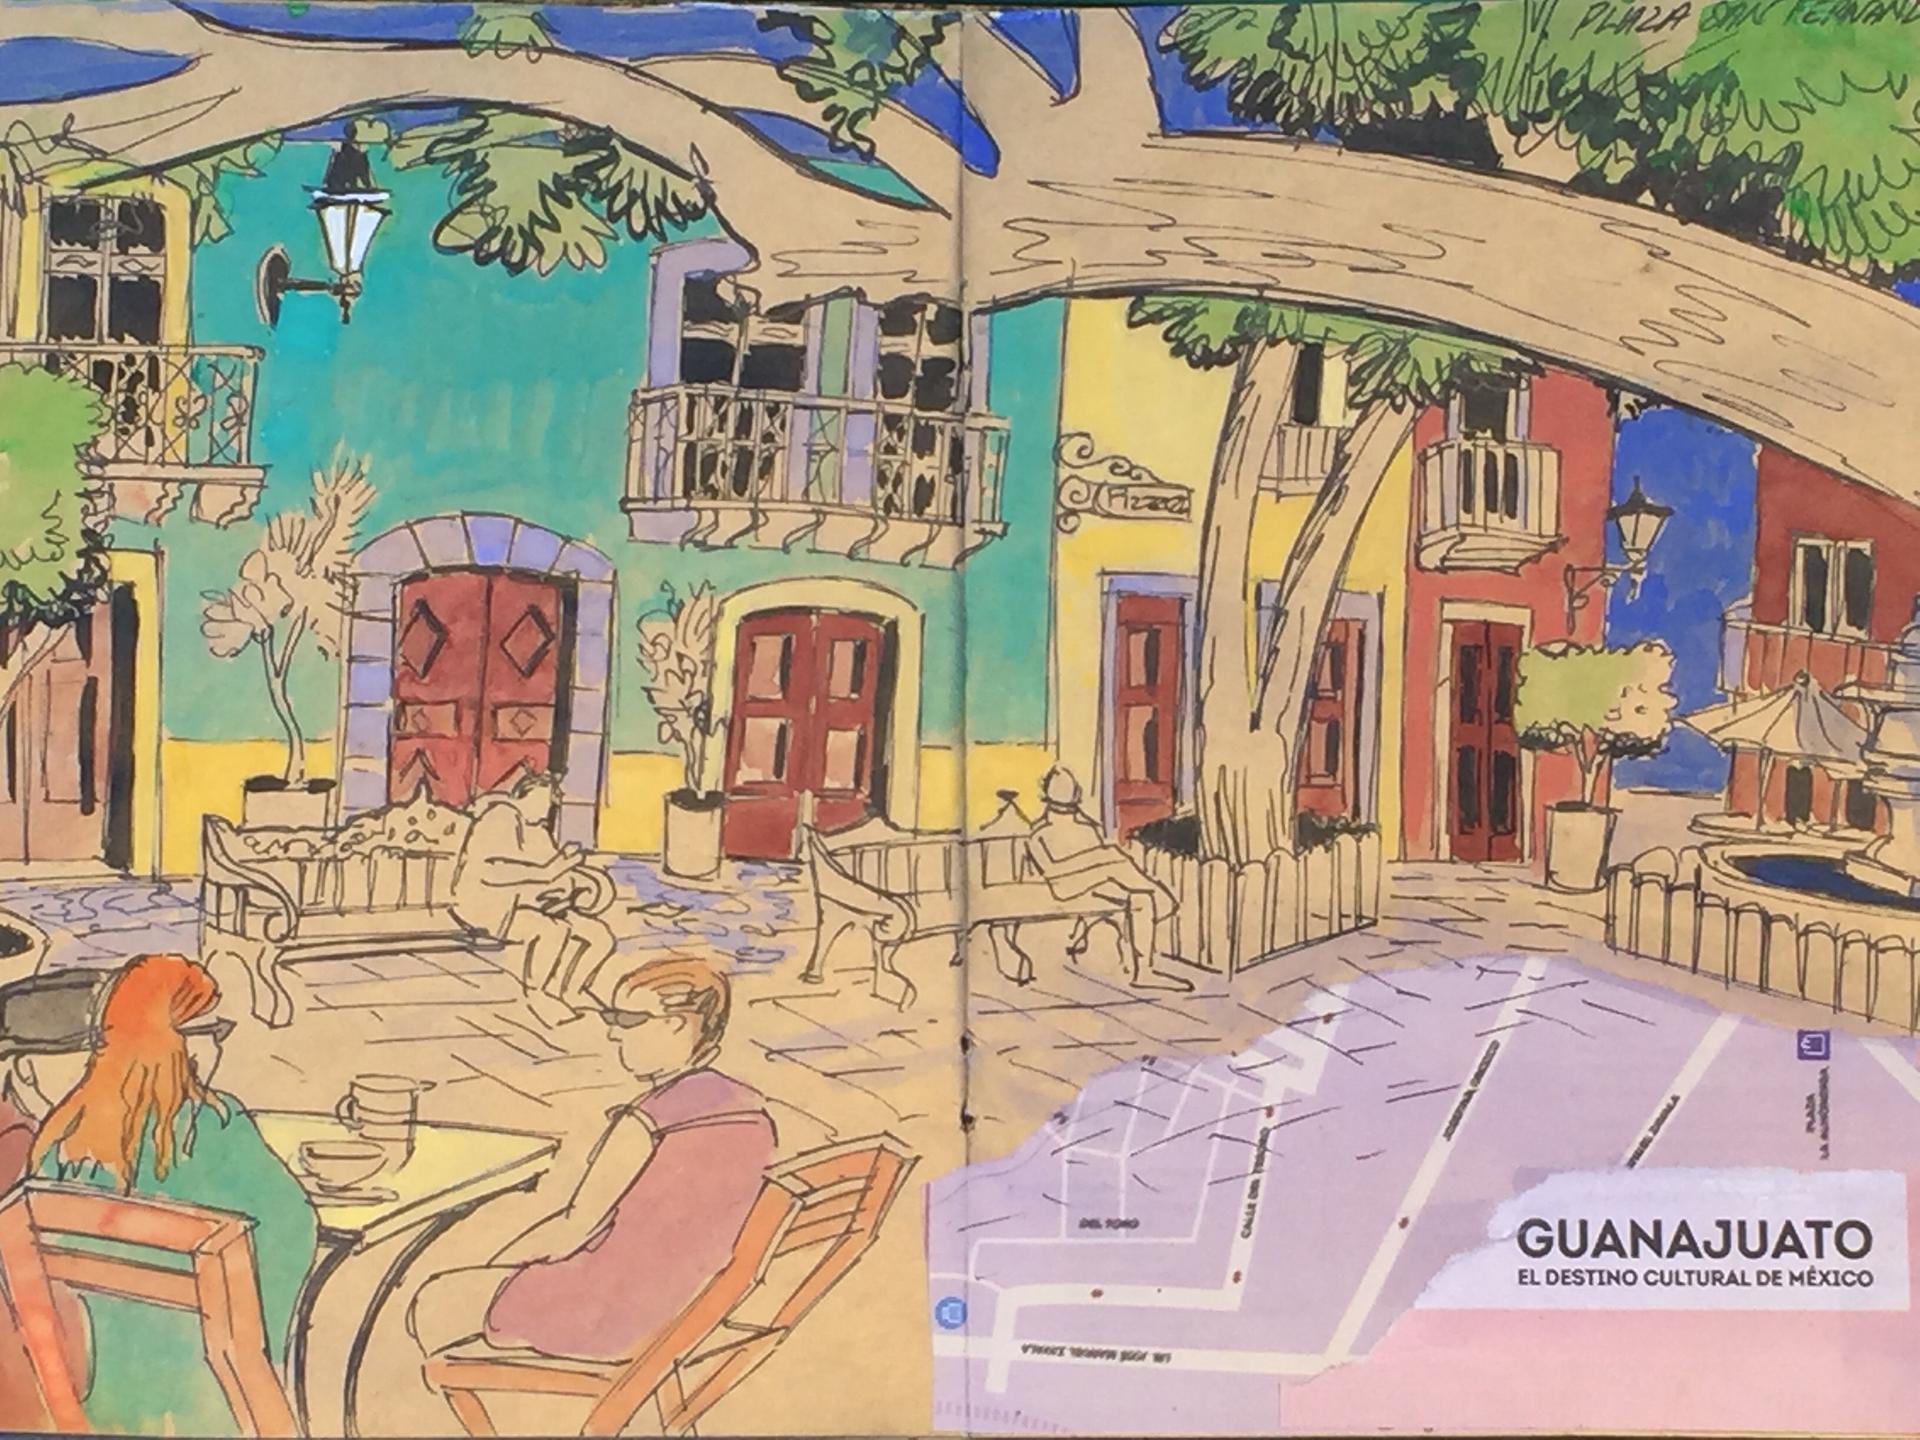 Guanajuato Sketch.jpg